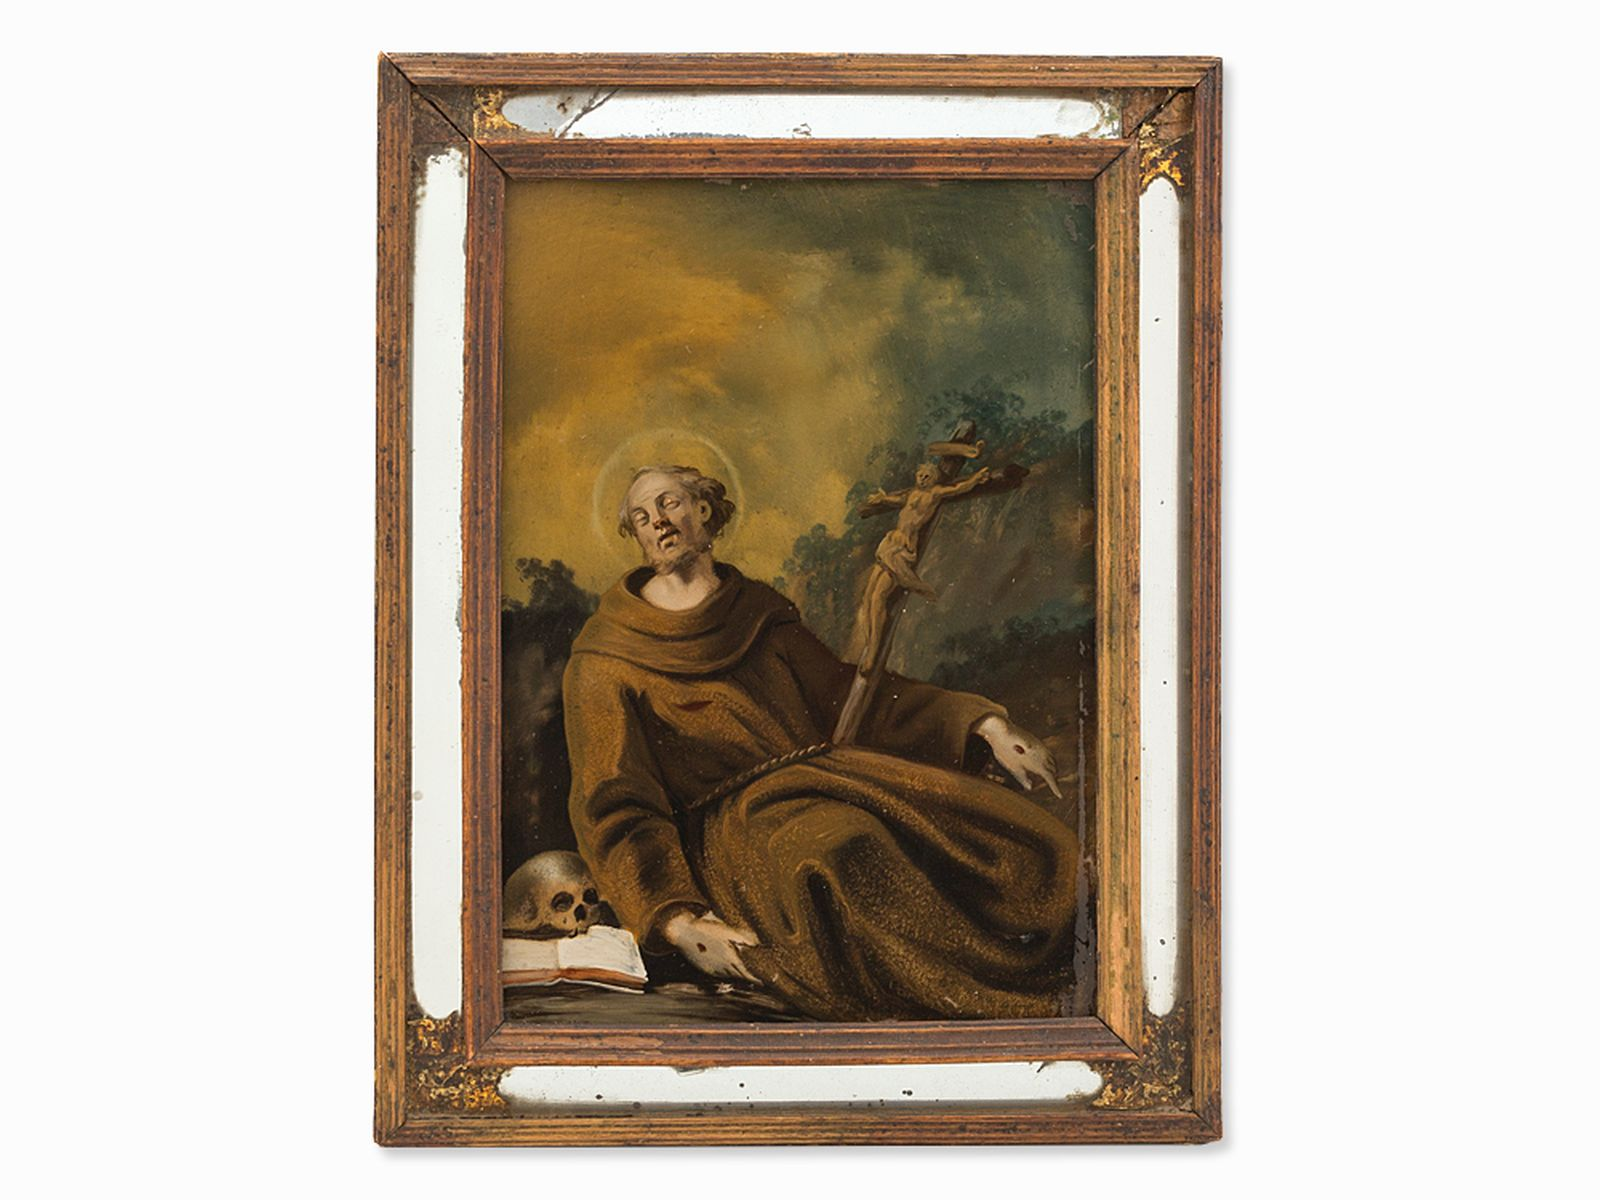 #11 St. Francis, Reverse Glass Painting, Spanish School, 18th C.  Spanische Schule, Hl. Franziskus, 18. Jahrhundert Image